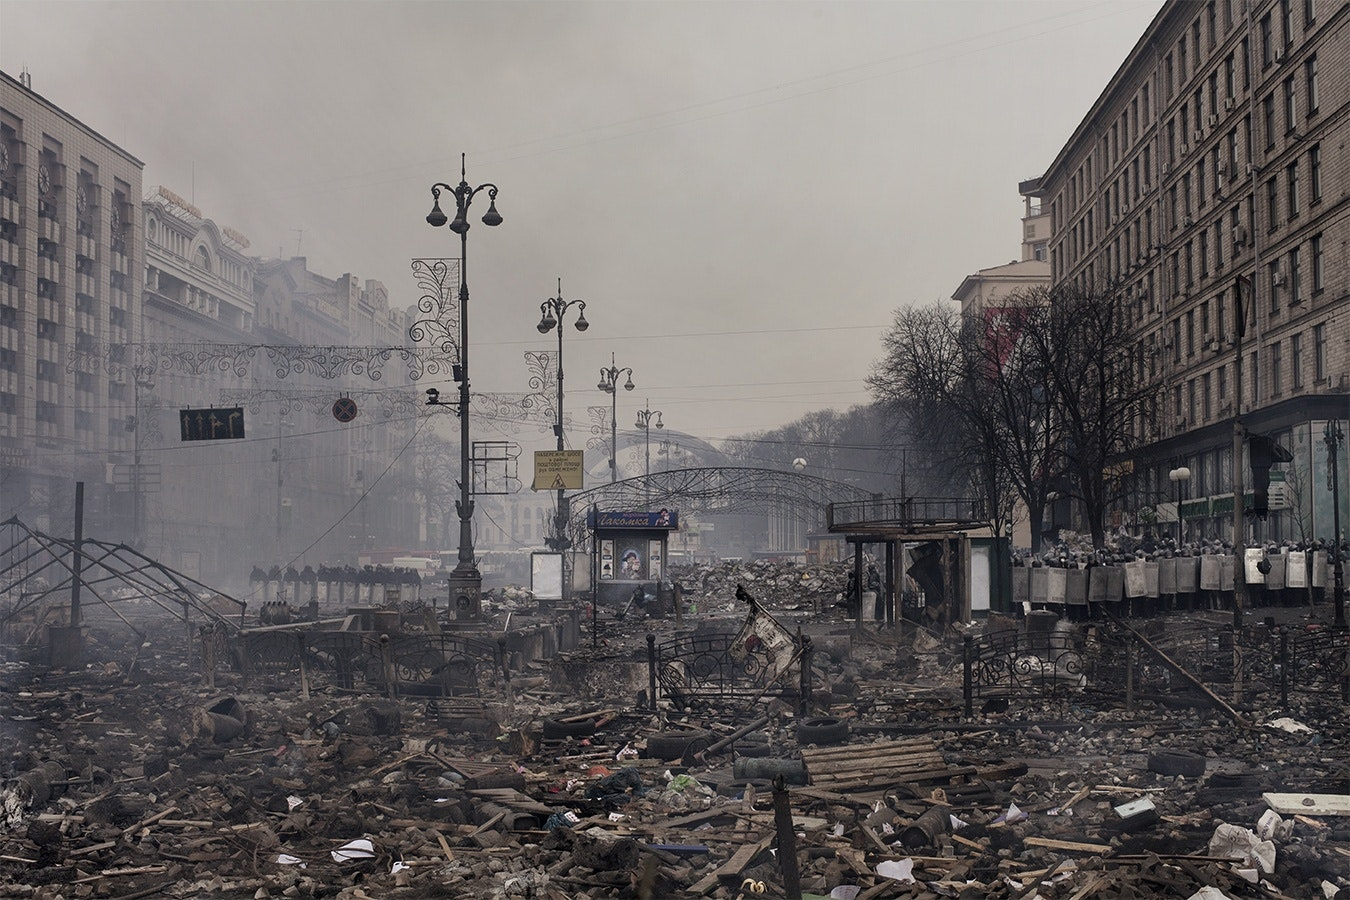 Debris in a city